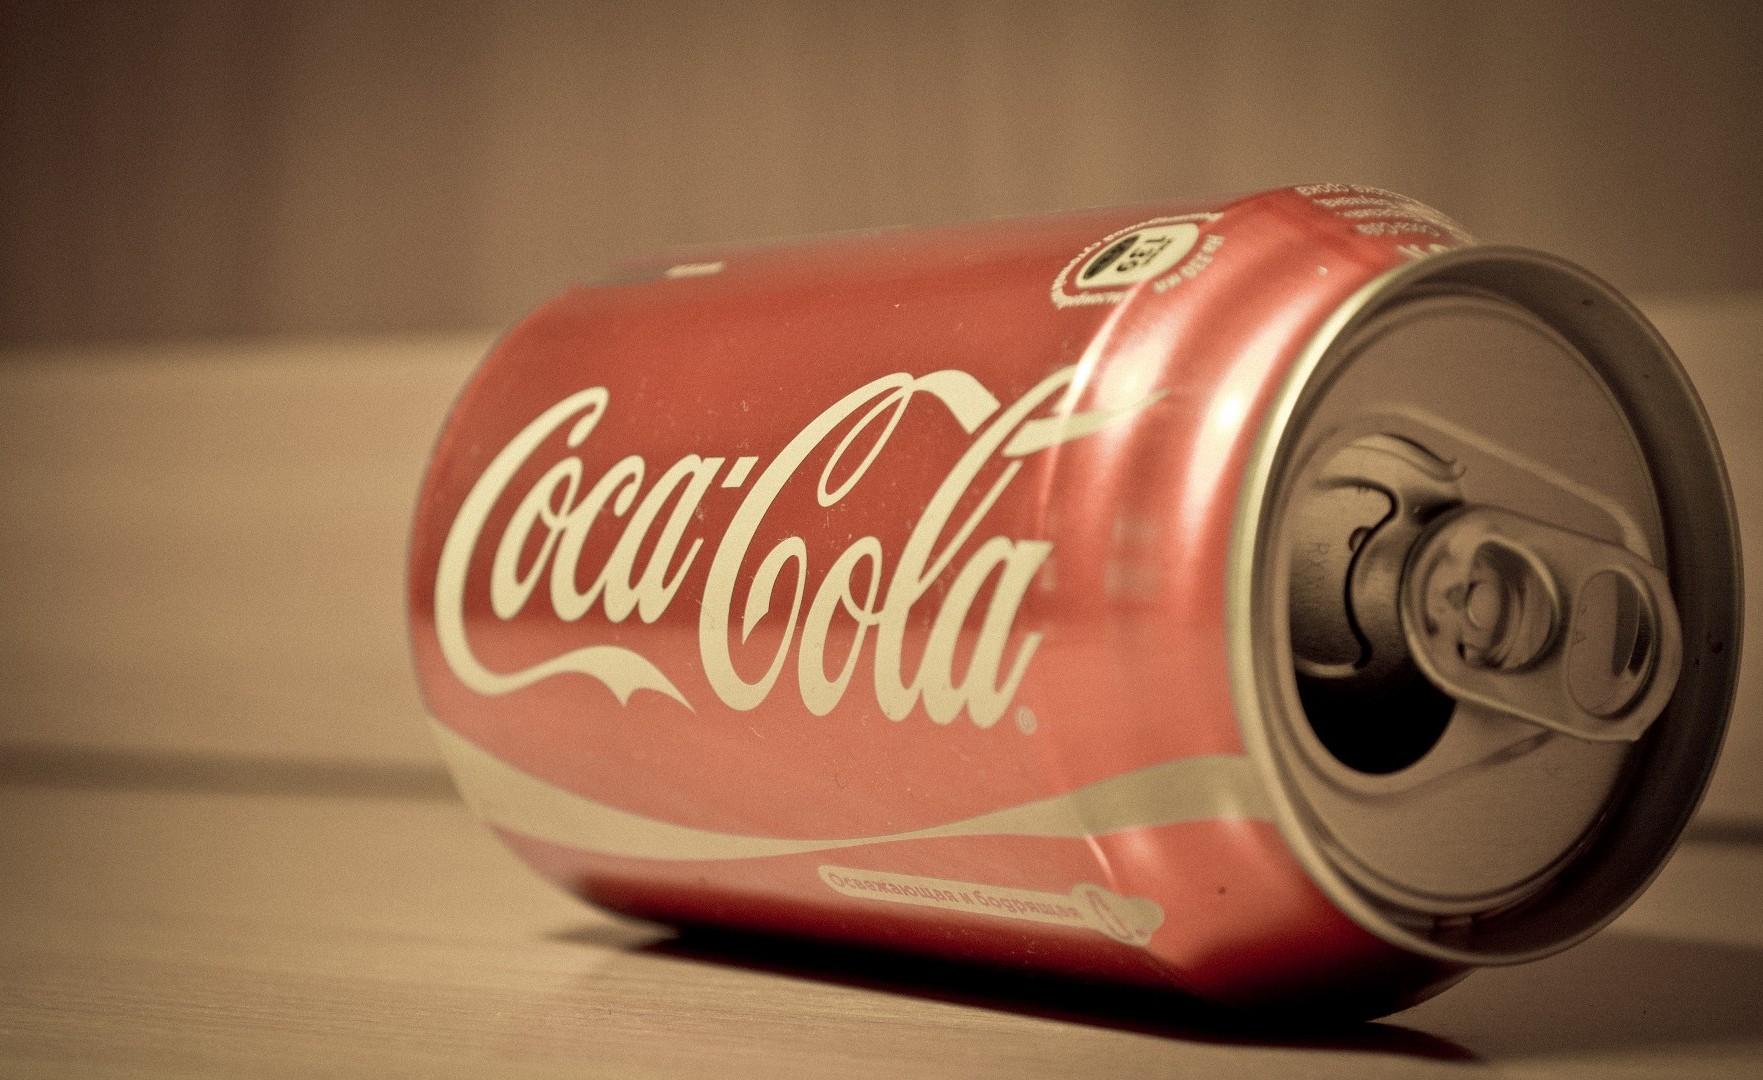 Coca-Cola testuje nowy design Trendy mediarun com coke puszka